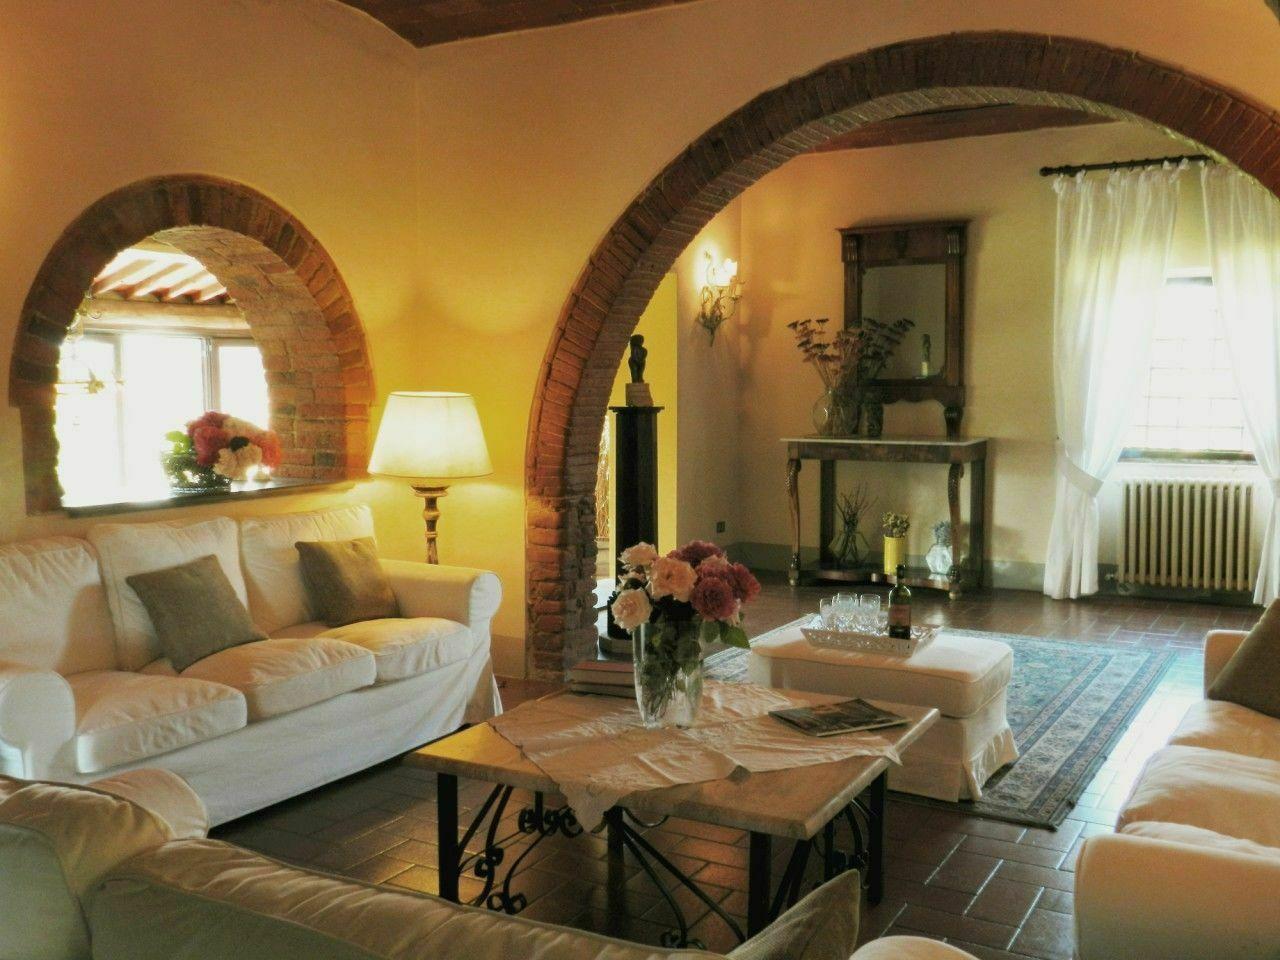 Villa Felciaiimage 16